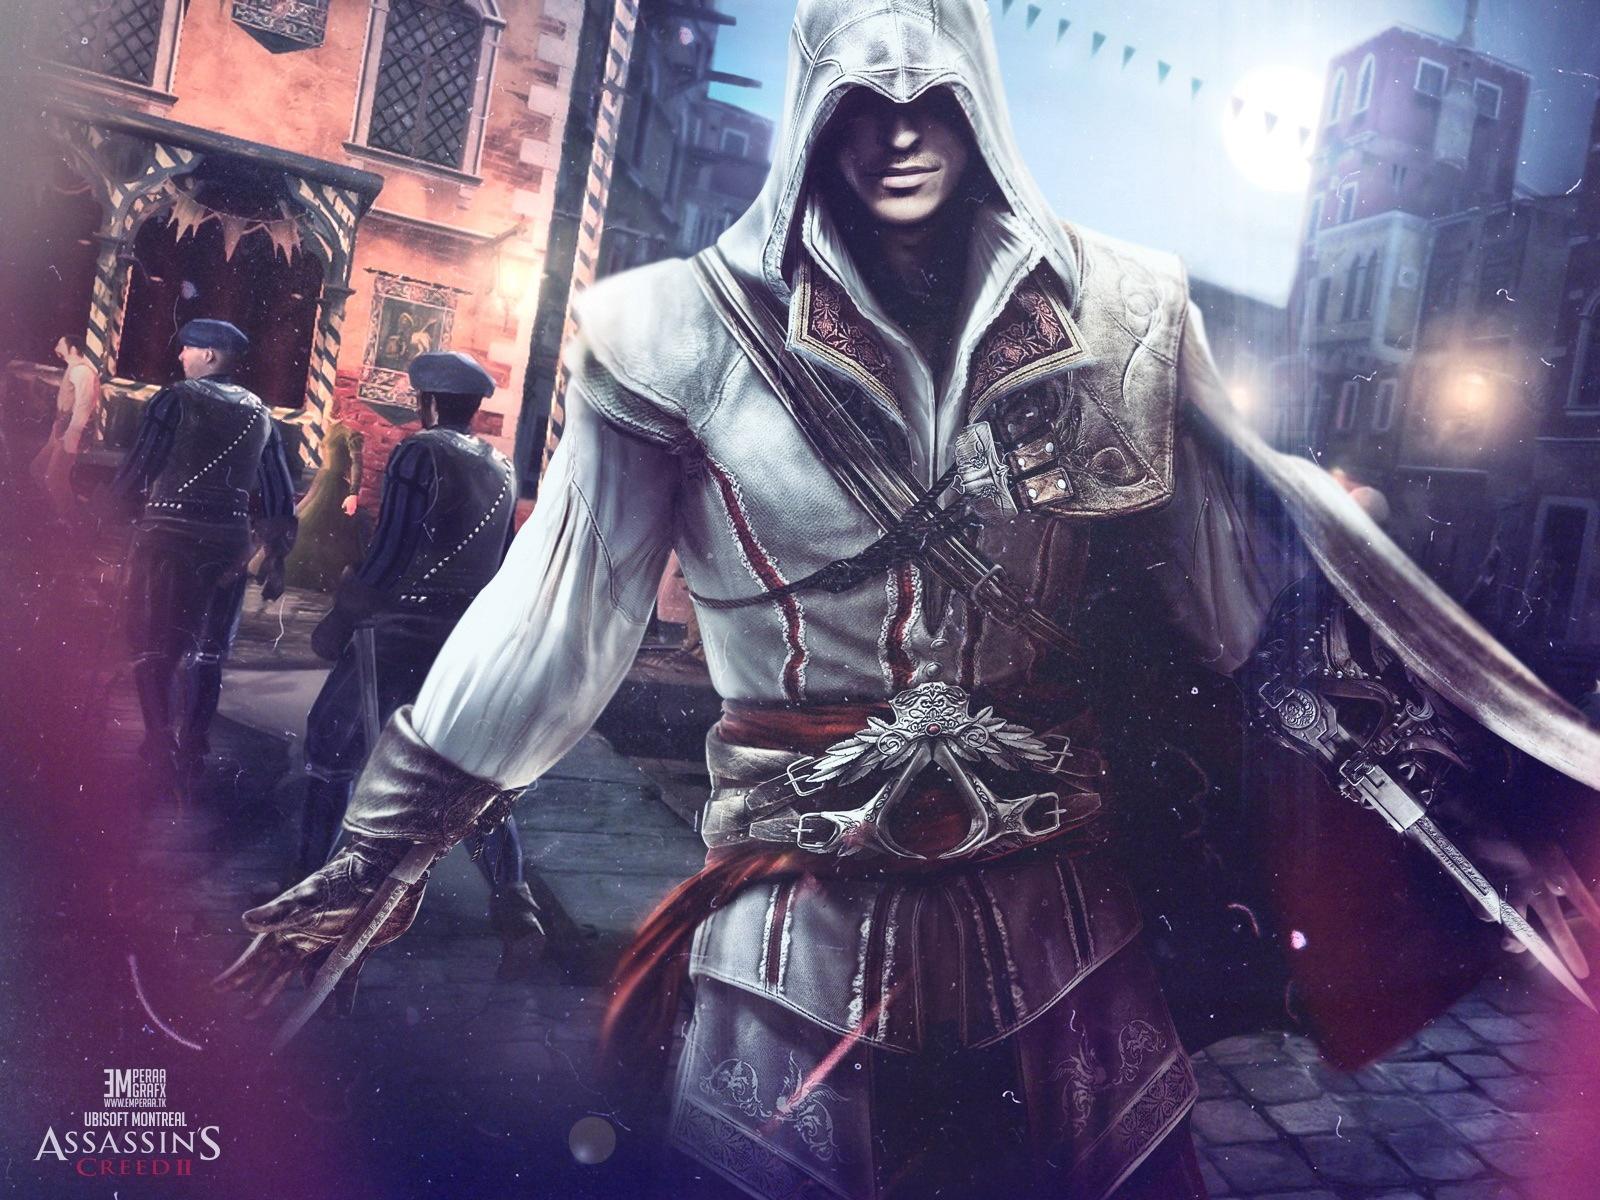 assassins creed wallpaper6 - photo #38